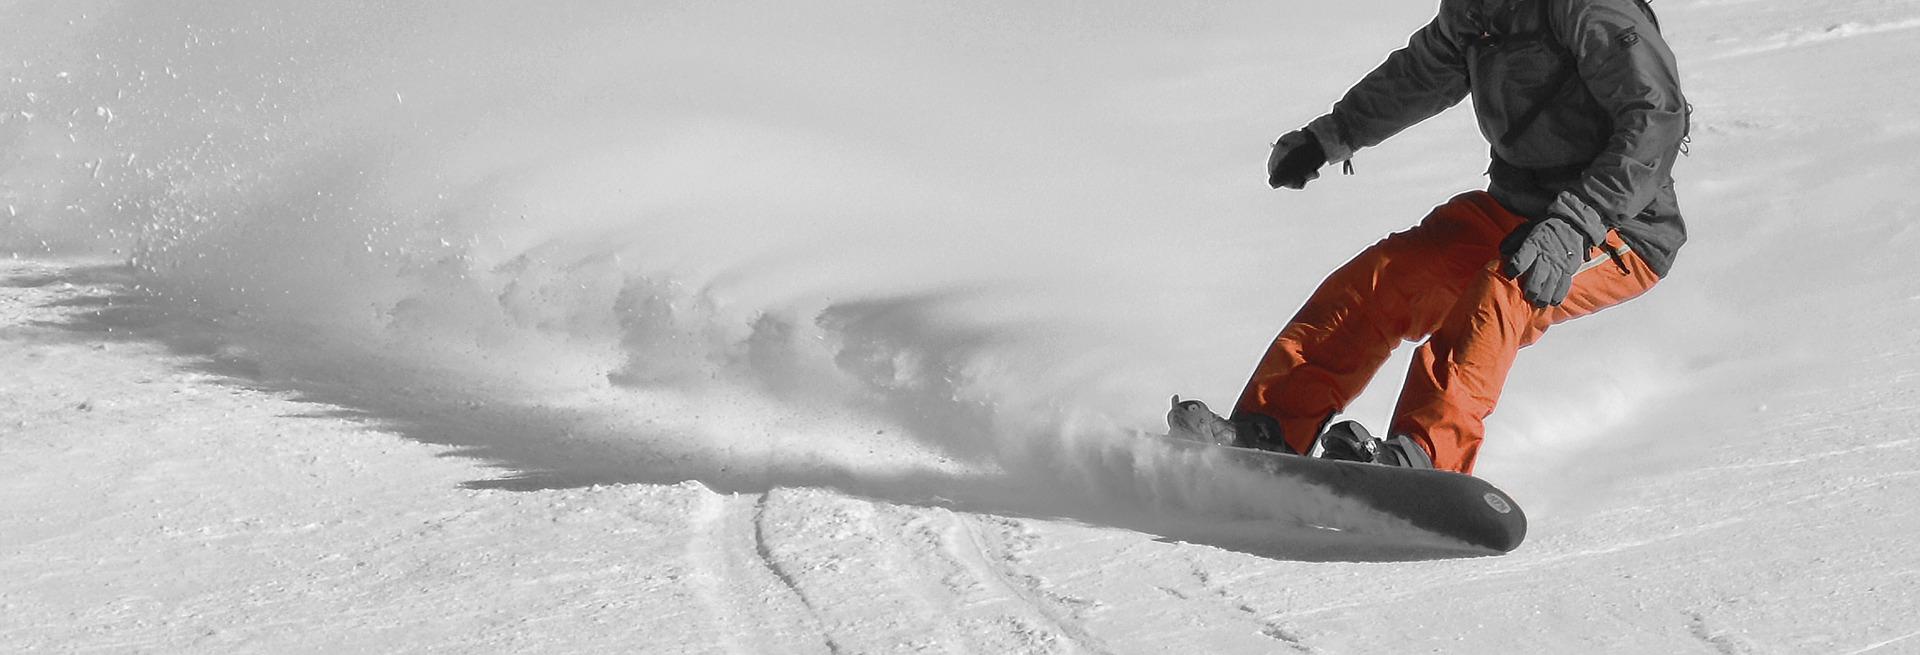 snowboarding-downhill